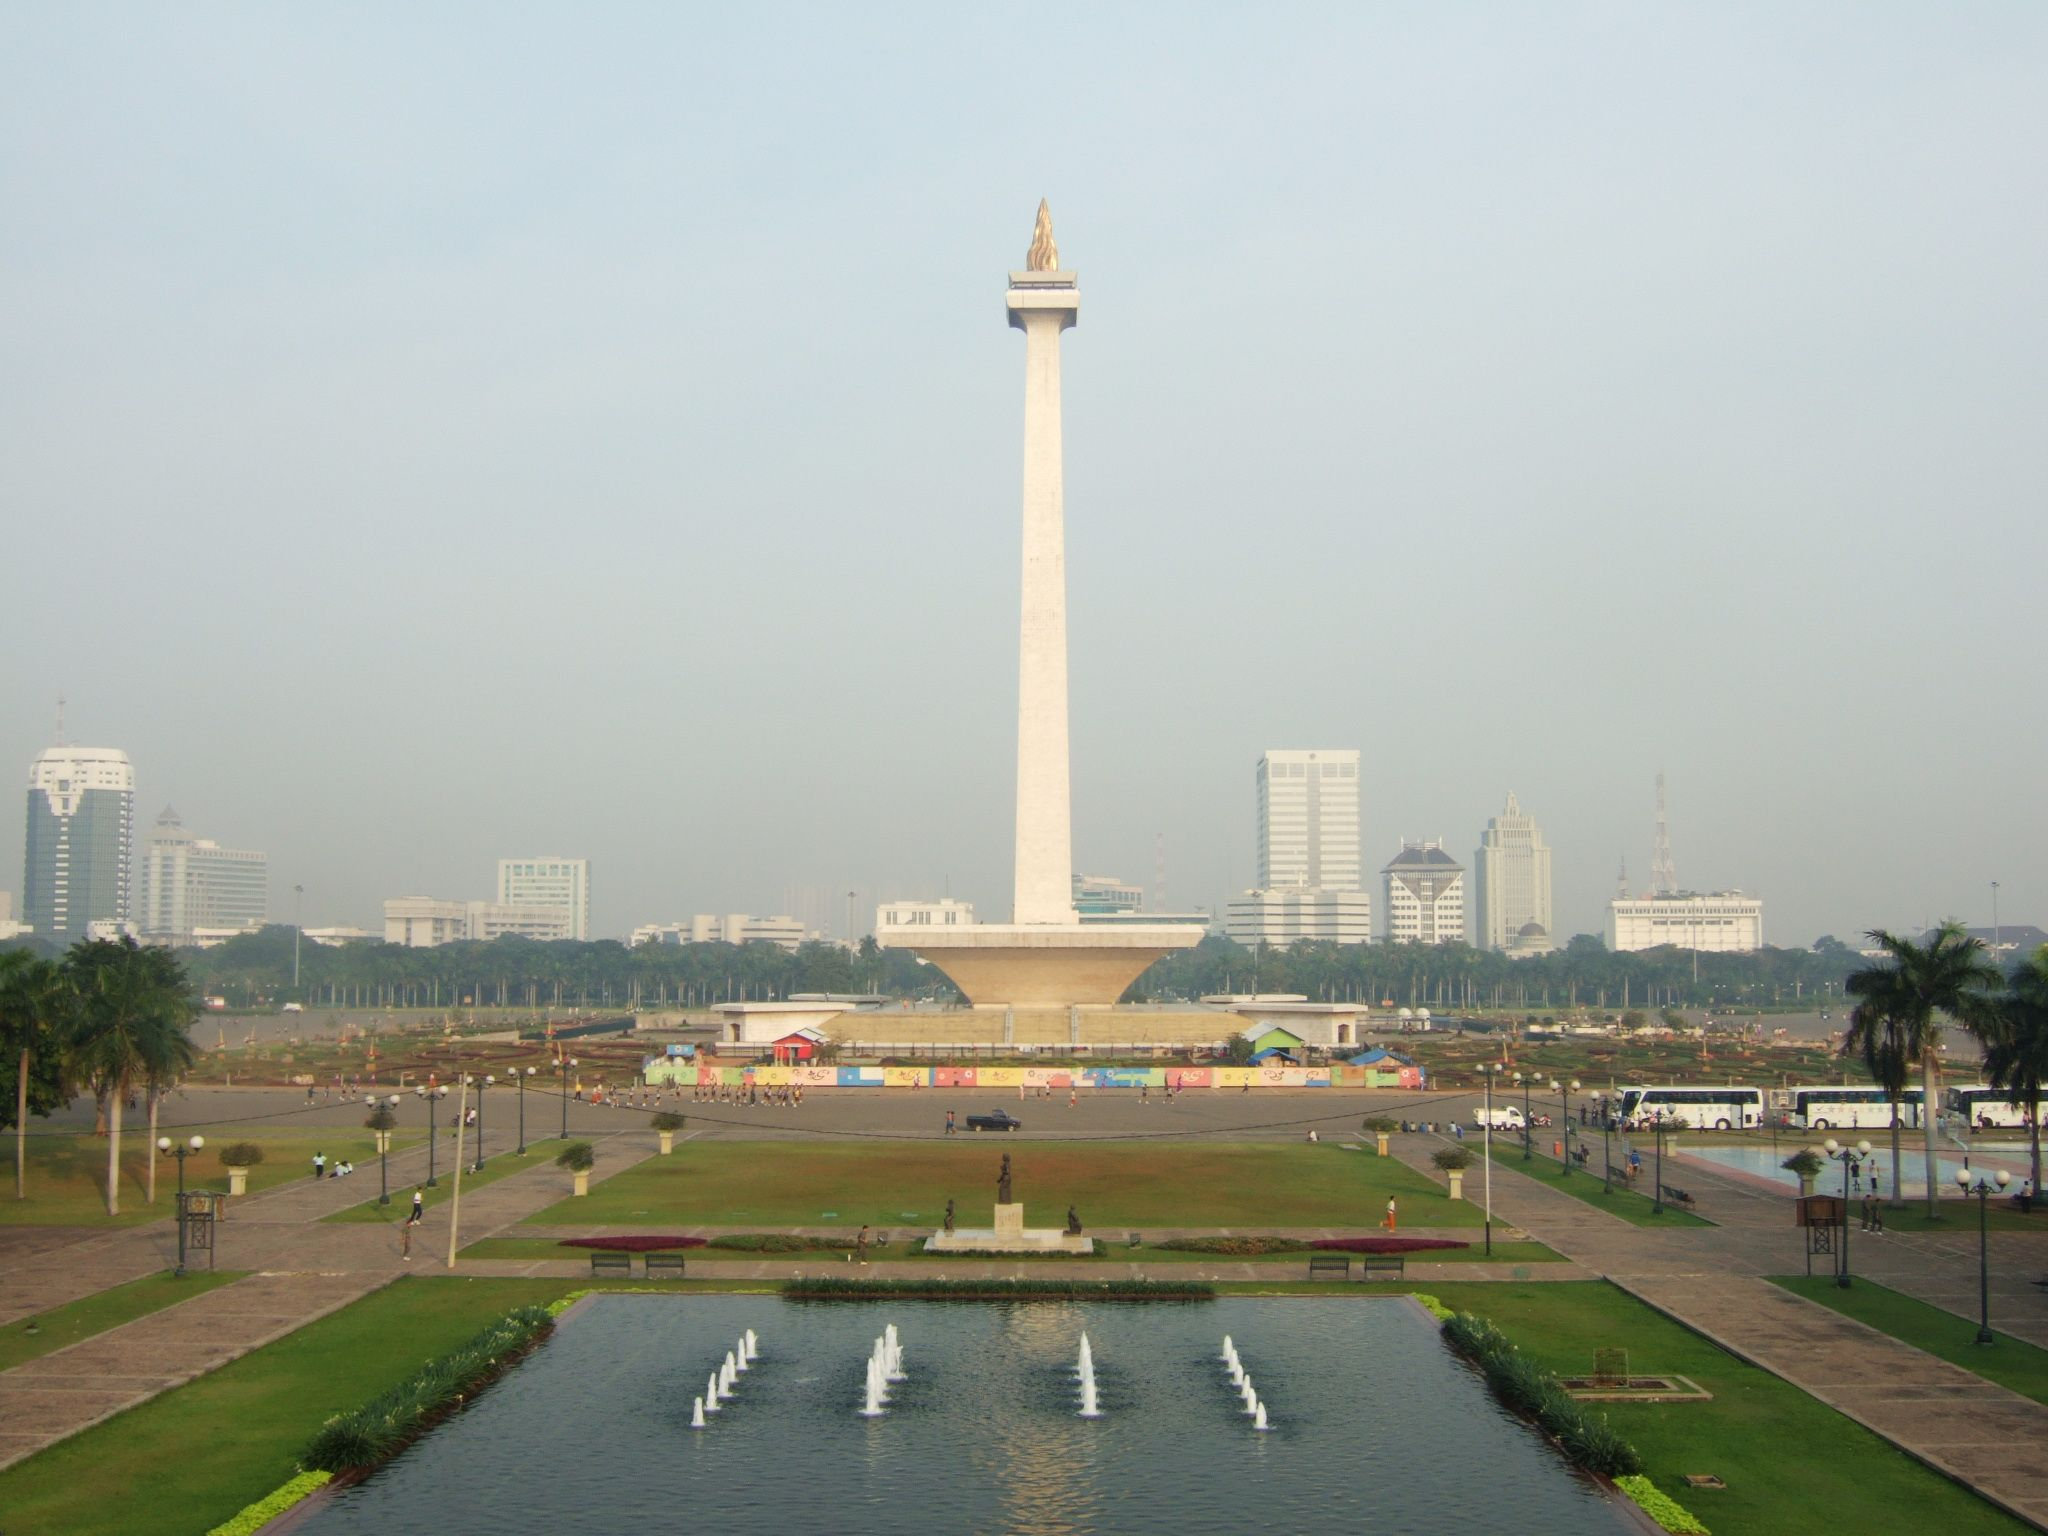 Ikon Jakarta, Ini 7 Fakta Unik Tentang Monas yang Jarang Diketahui